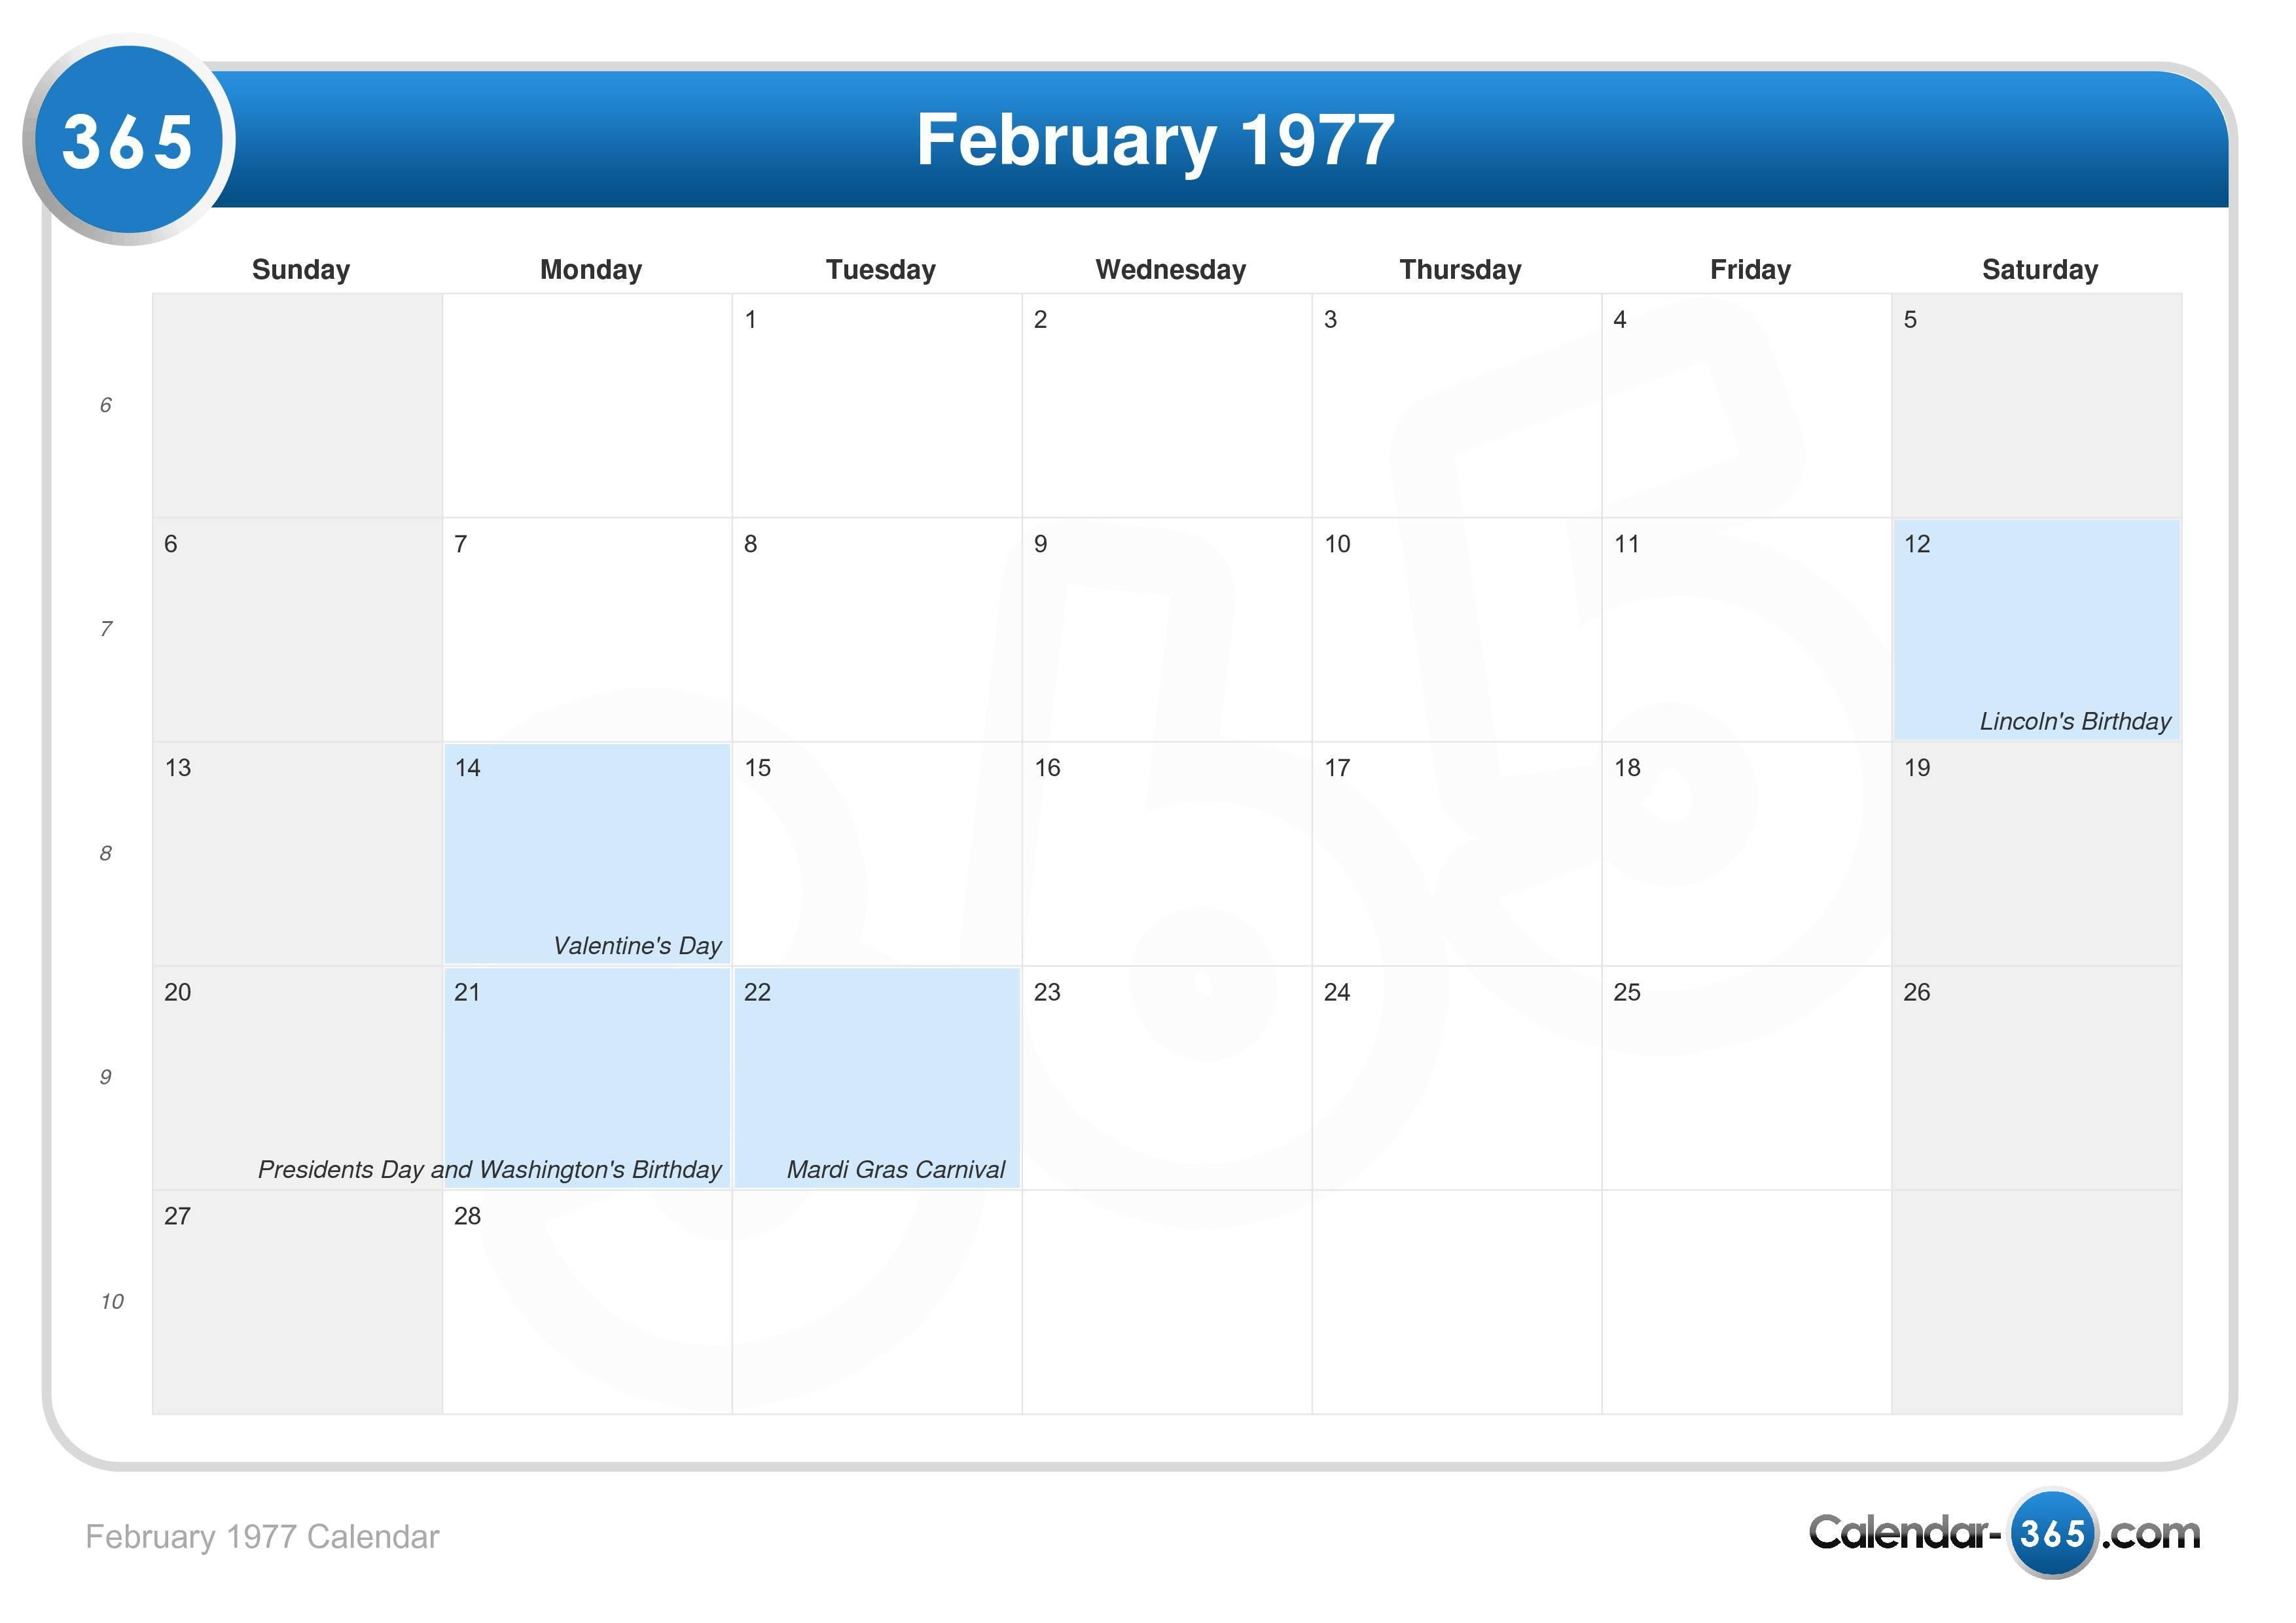 February 1977 Calendar